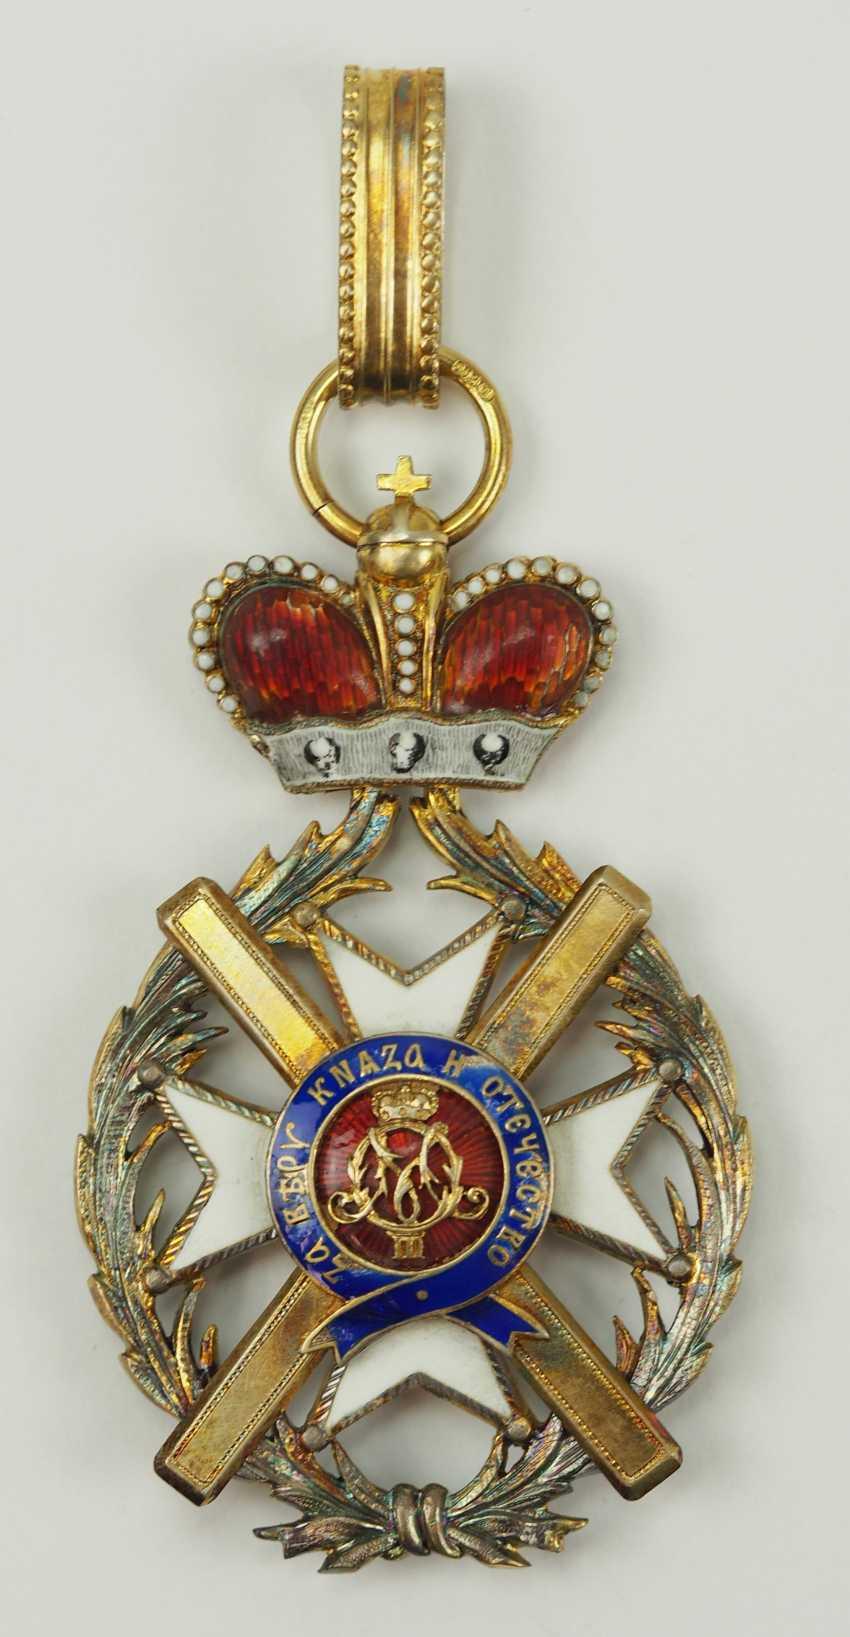 Serbia: order of the cross of Takowo, 1. Model (1865-1868), Comtur Cross. - photo 1